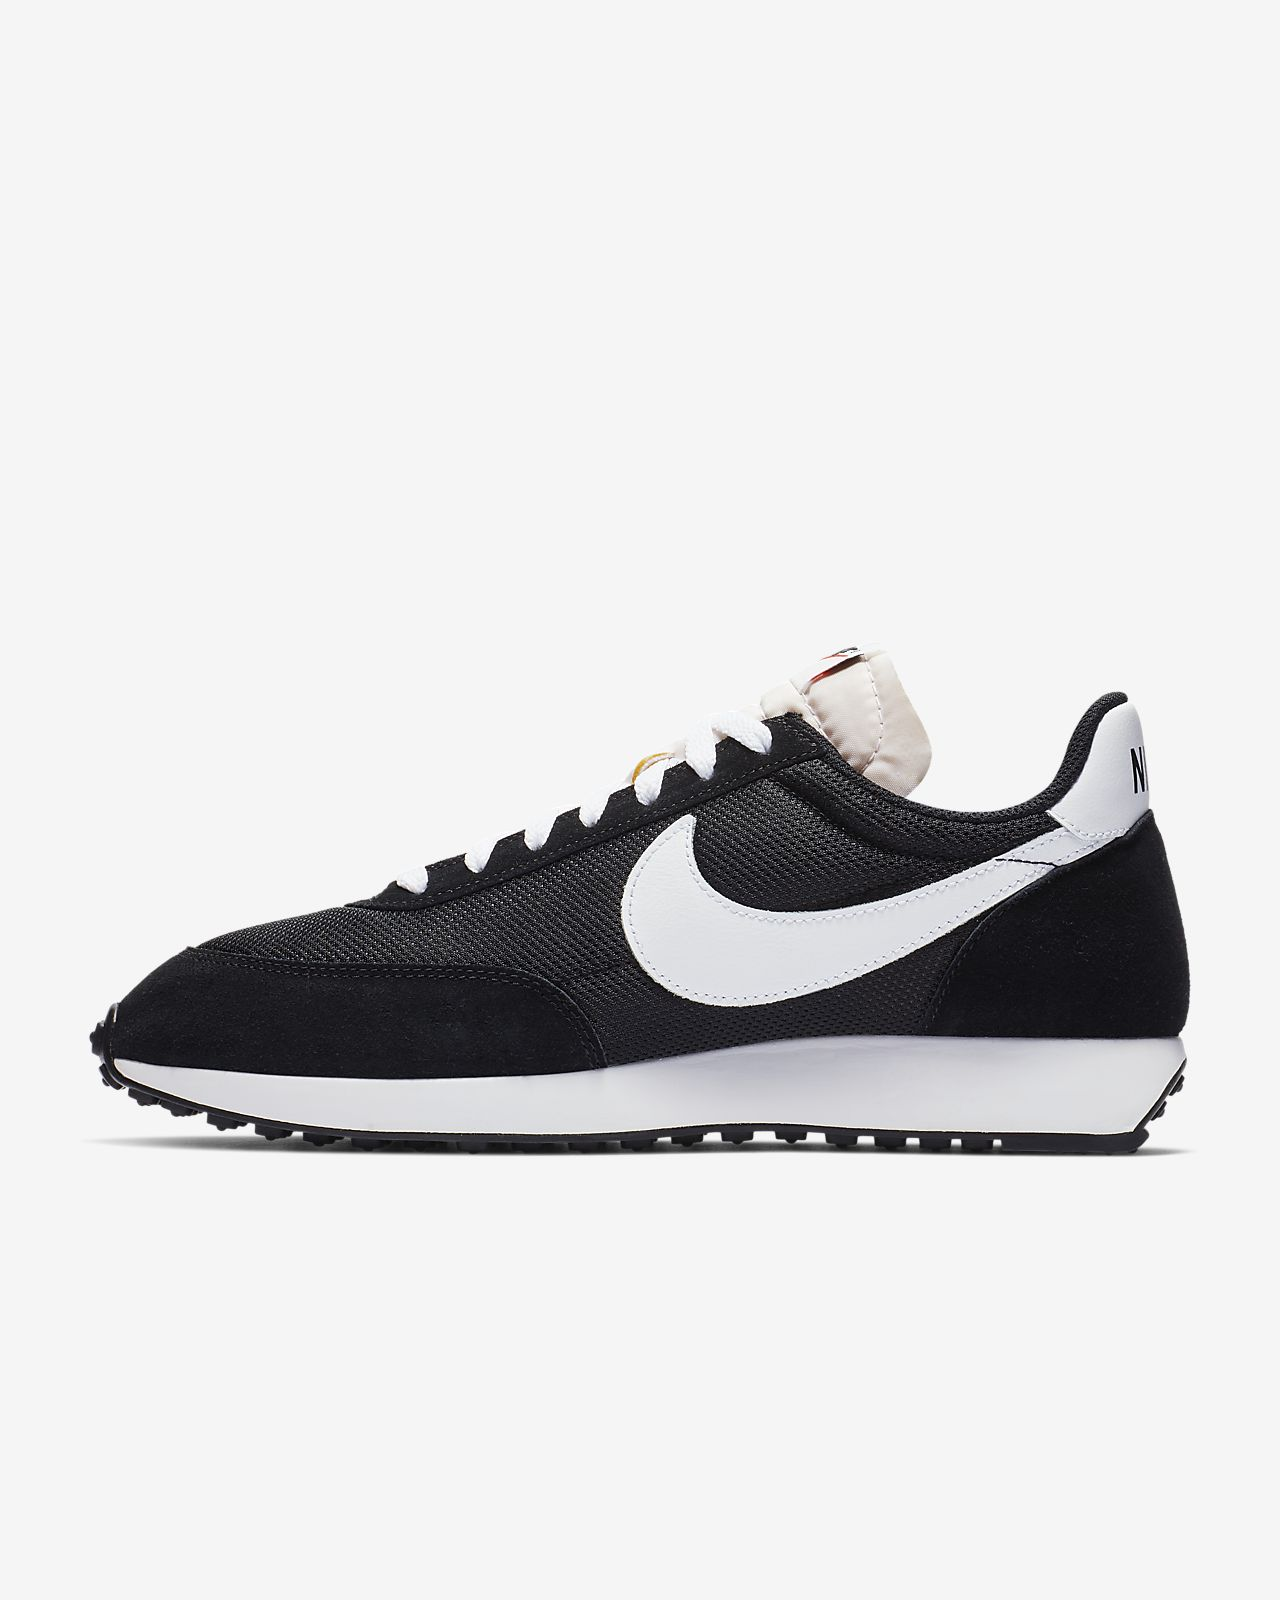 buy popular 7e528 249d2 ... Buty męskie Nike Air Tailwind 79